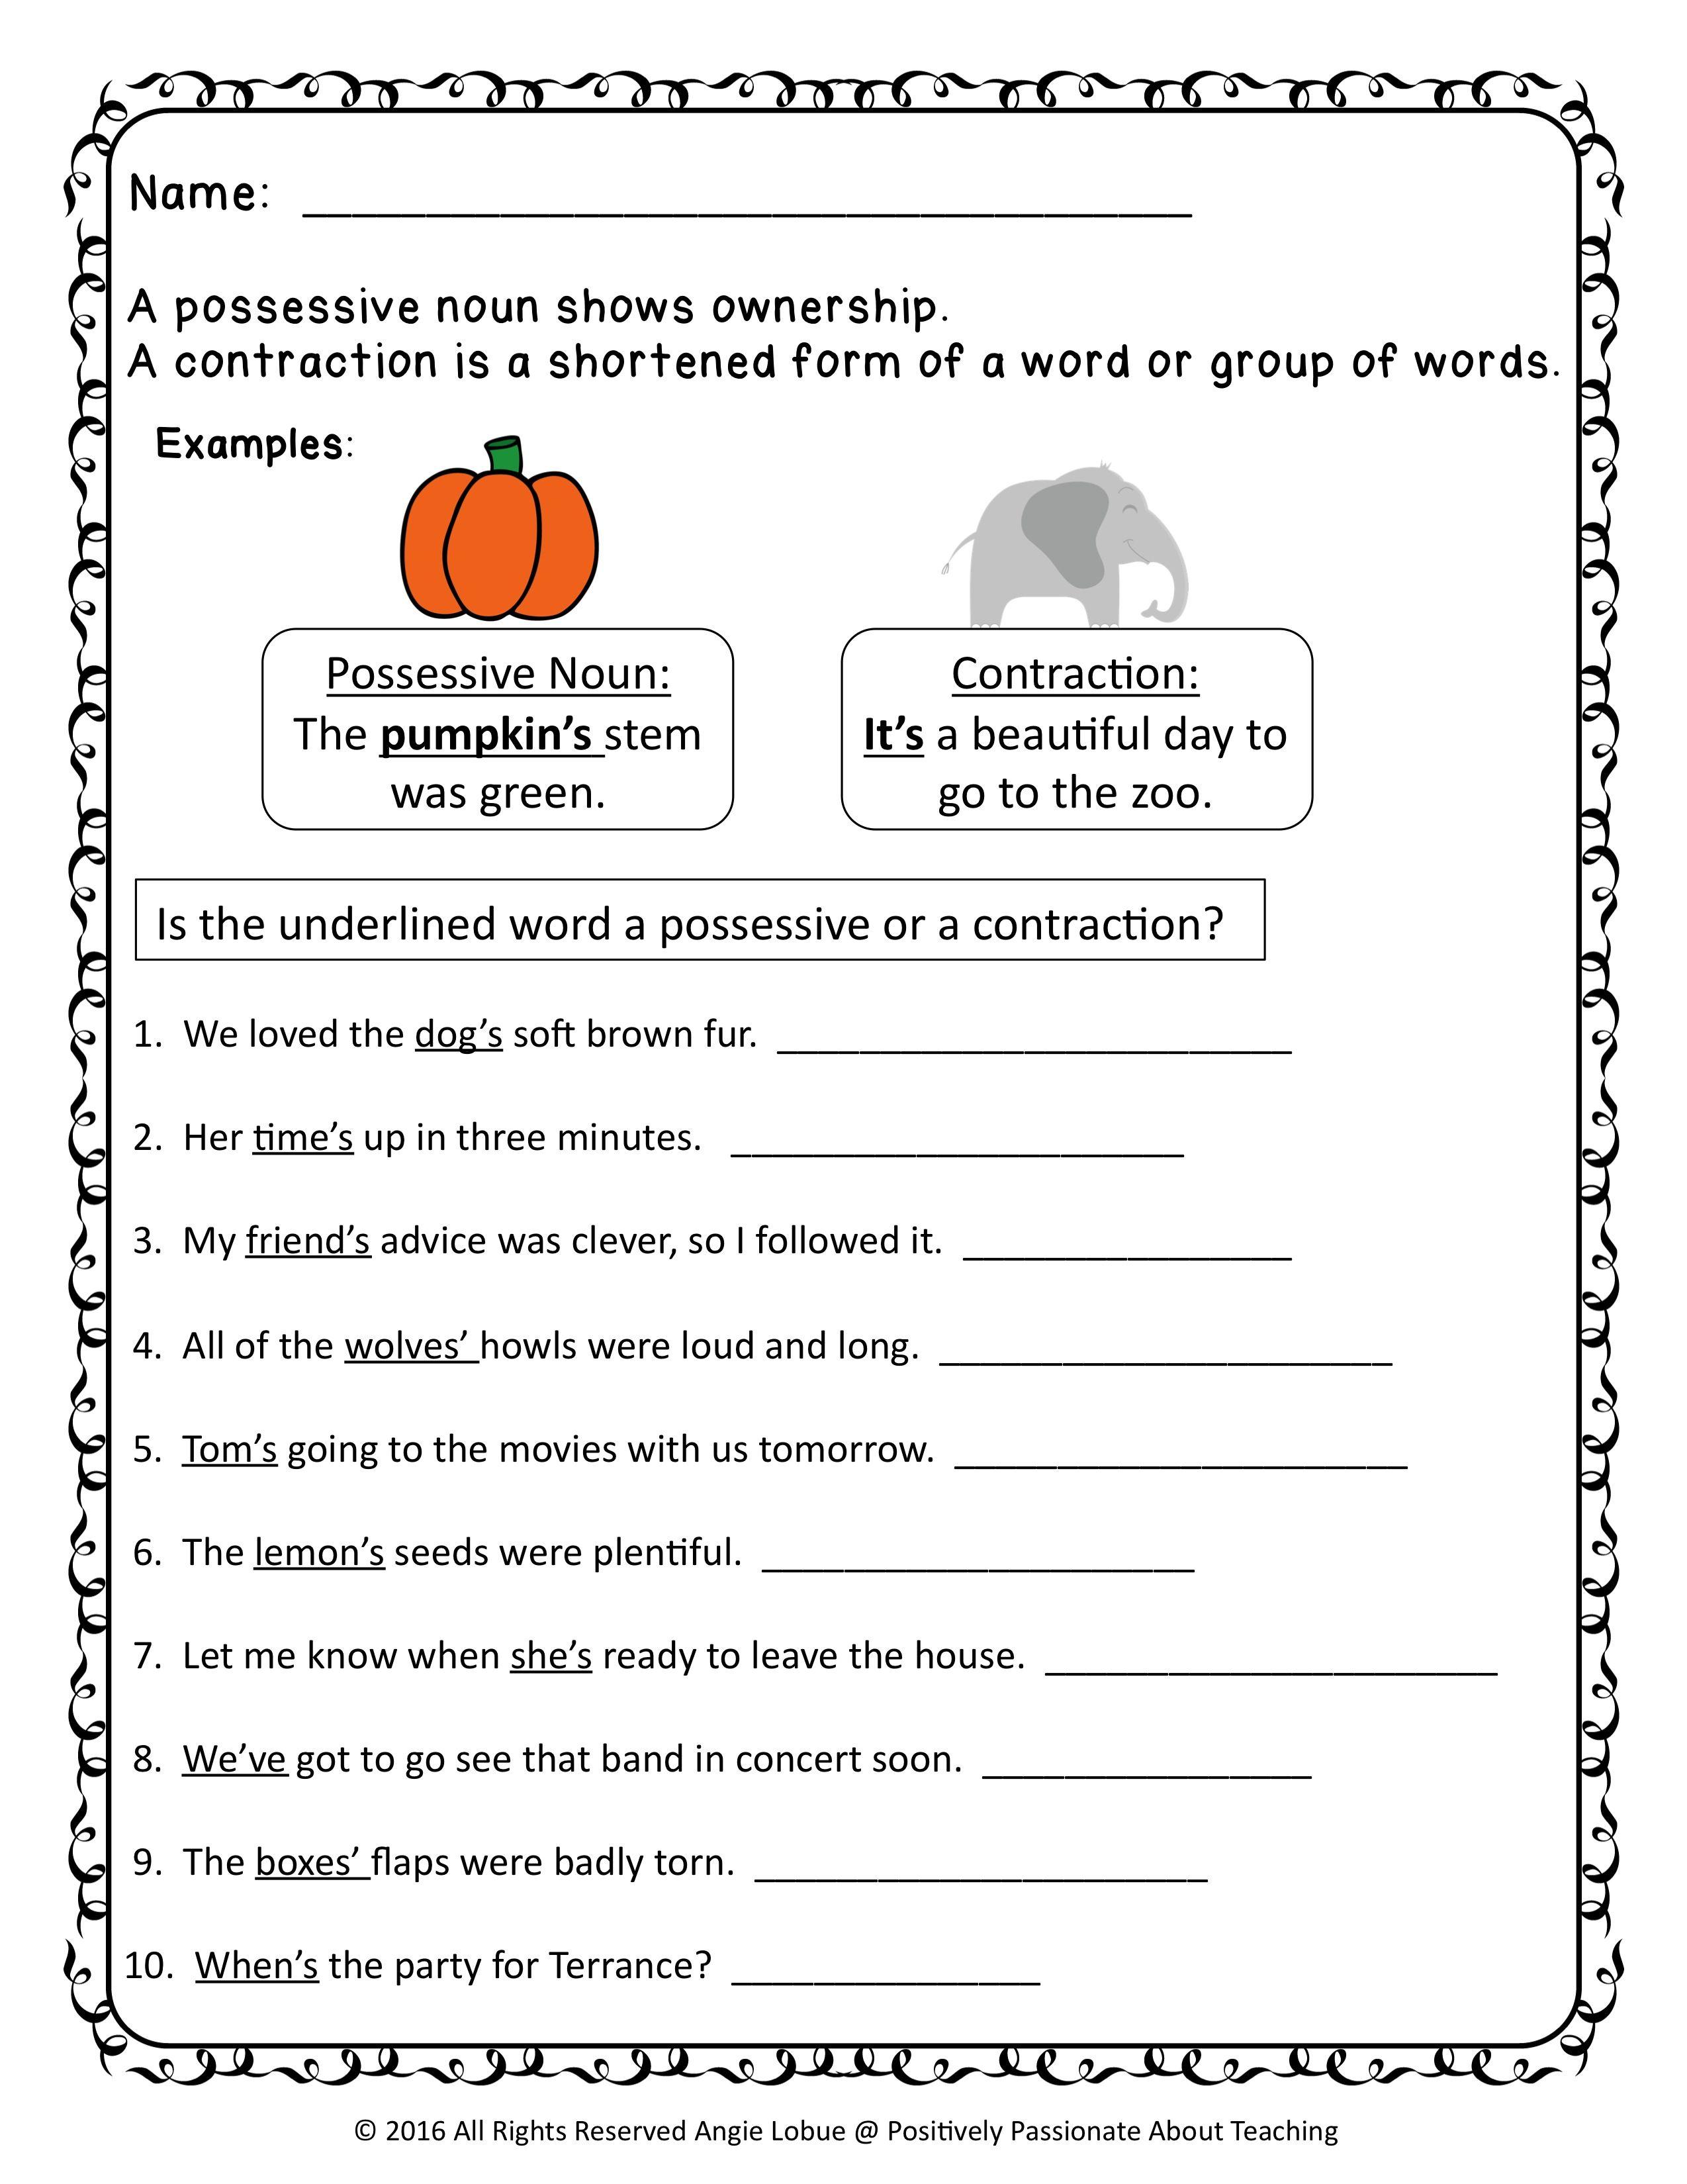 medium resolution of Contractions Possessives Worksheets Kindergarten   Printable Worksheets and  Activities for Teachers